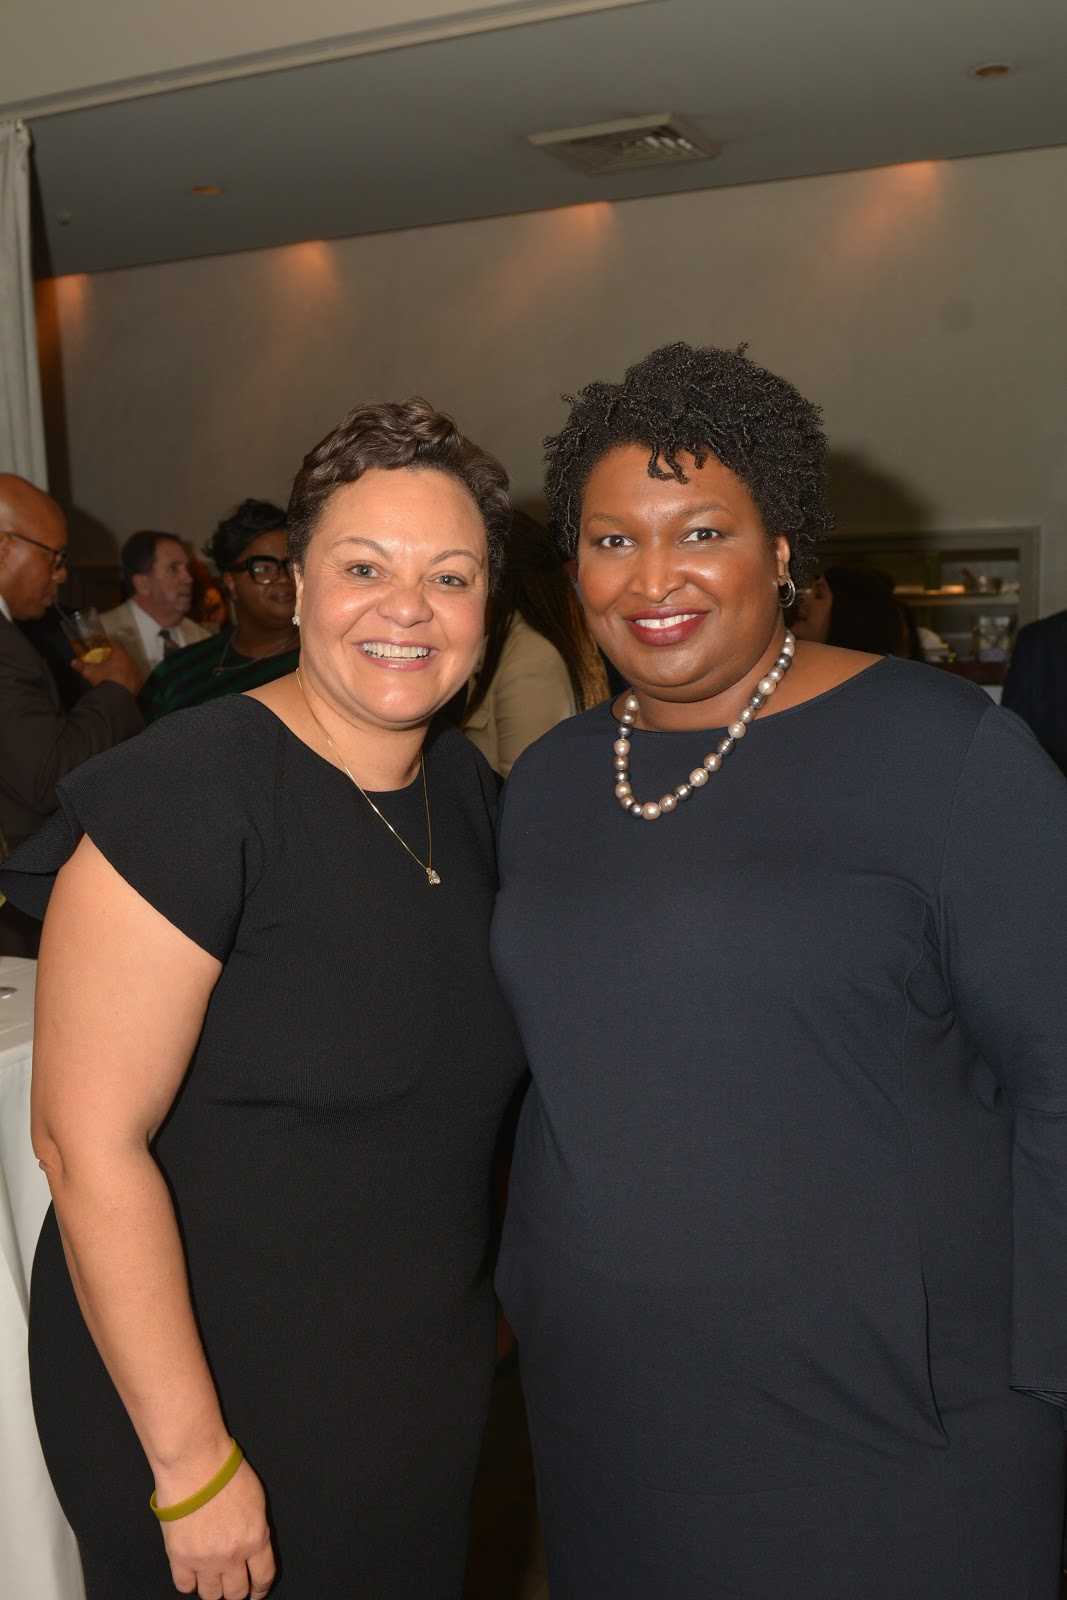 Senator Karen Carter Peterson and Stacey Abrams